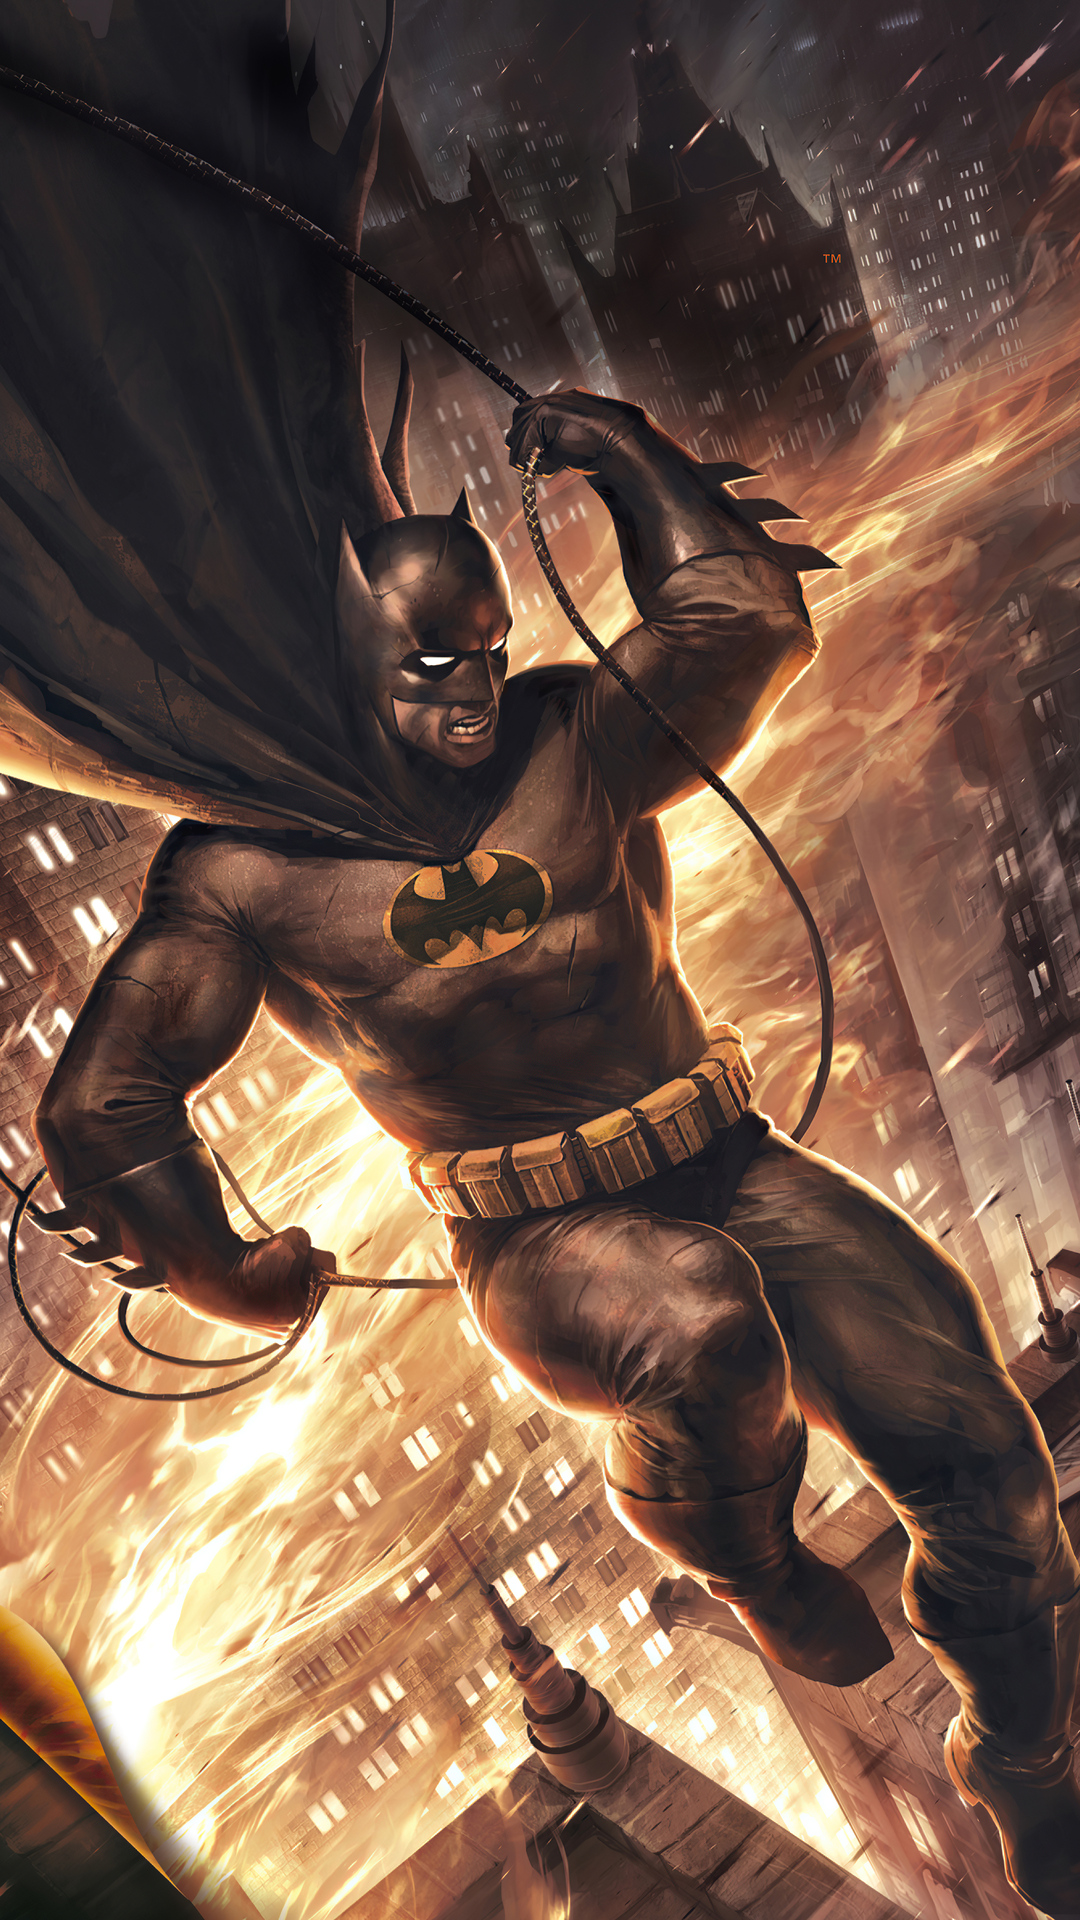 Dark Knight Returns In City 4k Iphone ...